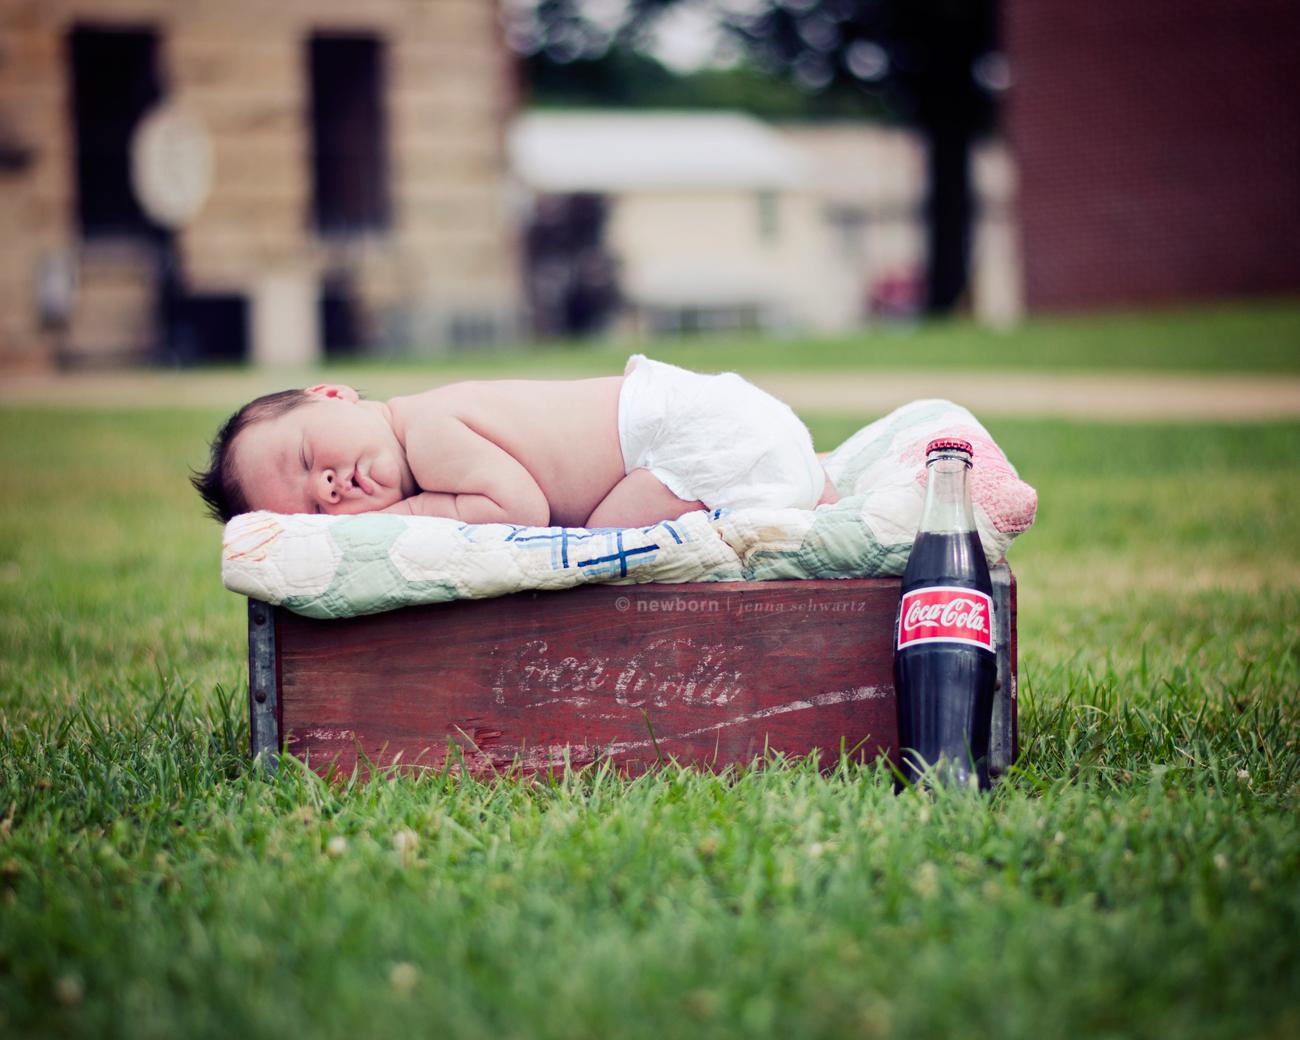 viewDSC_6151small Vintage Outdoor Newborn Edit